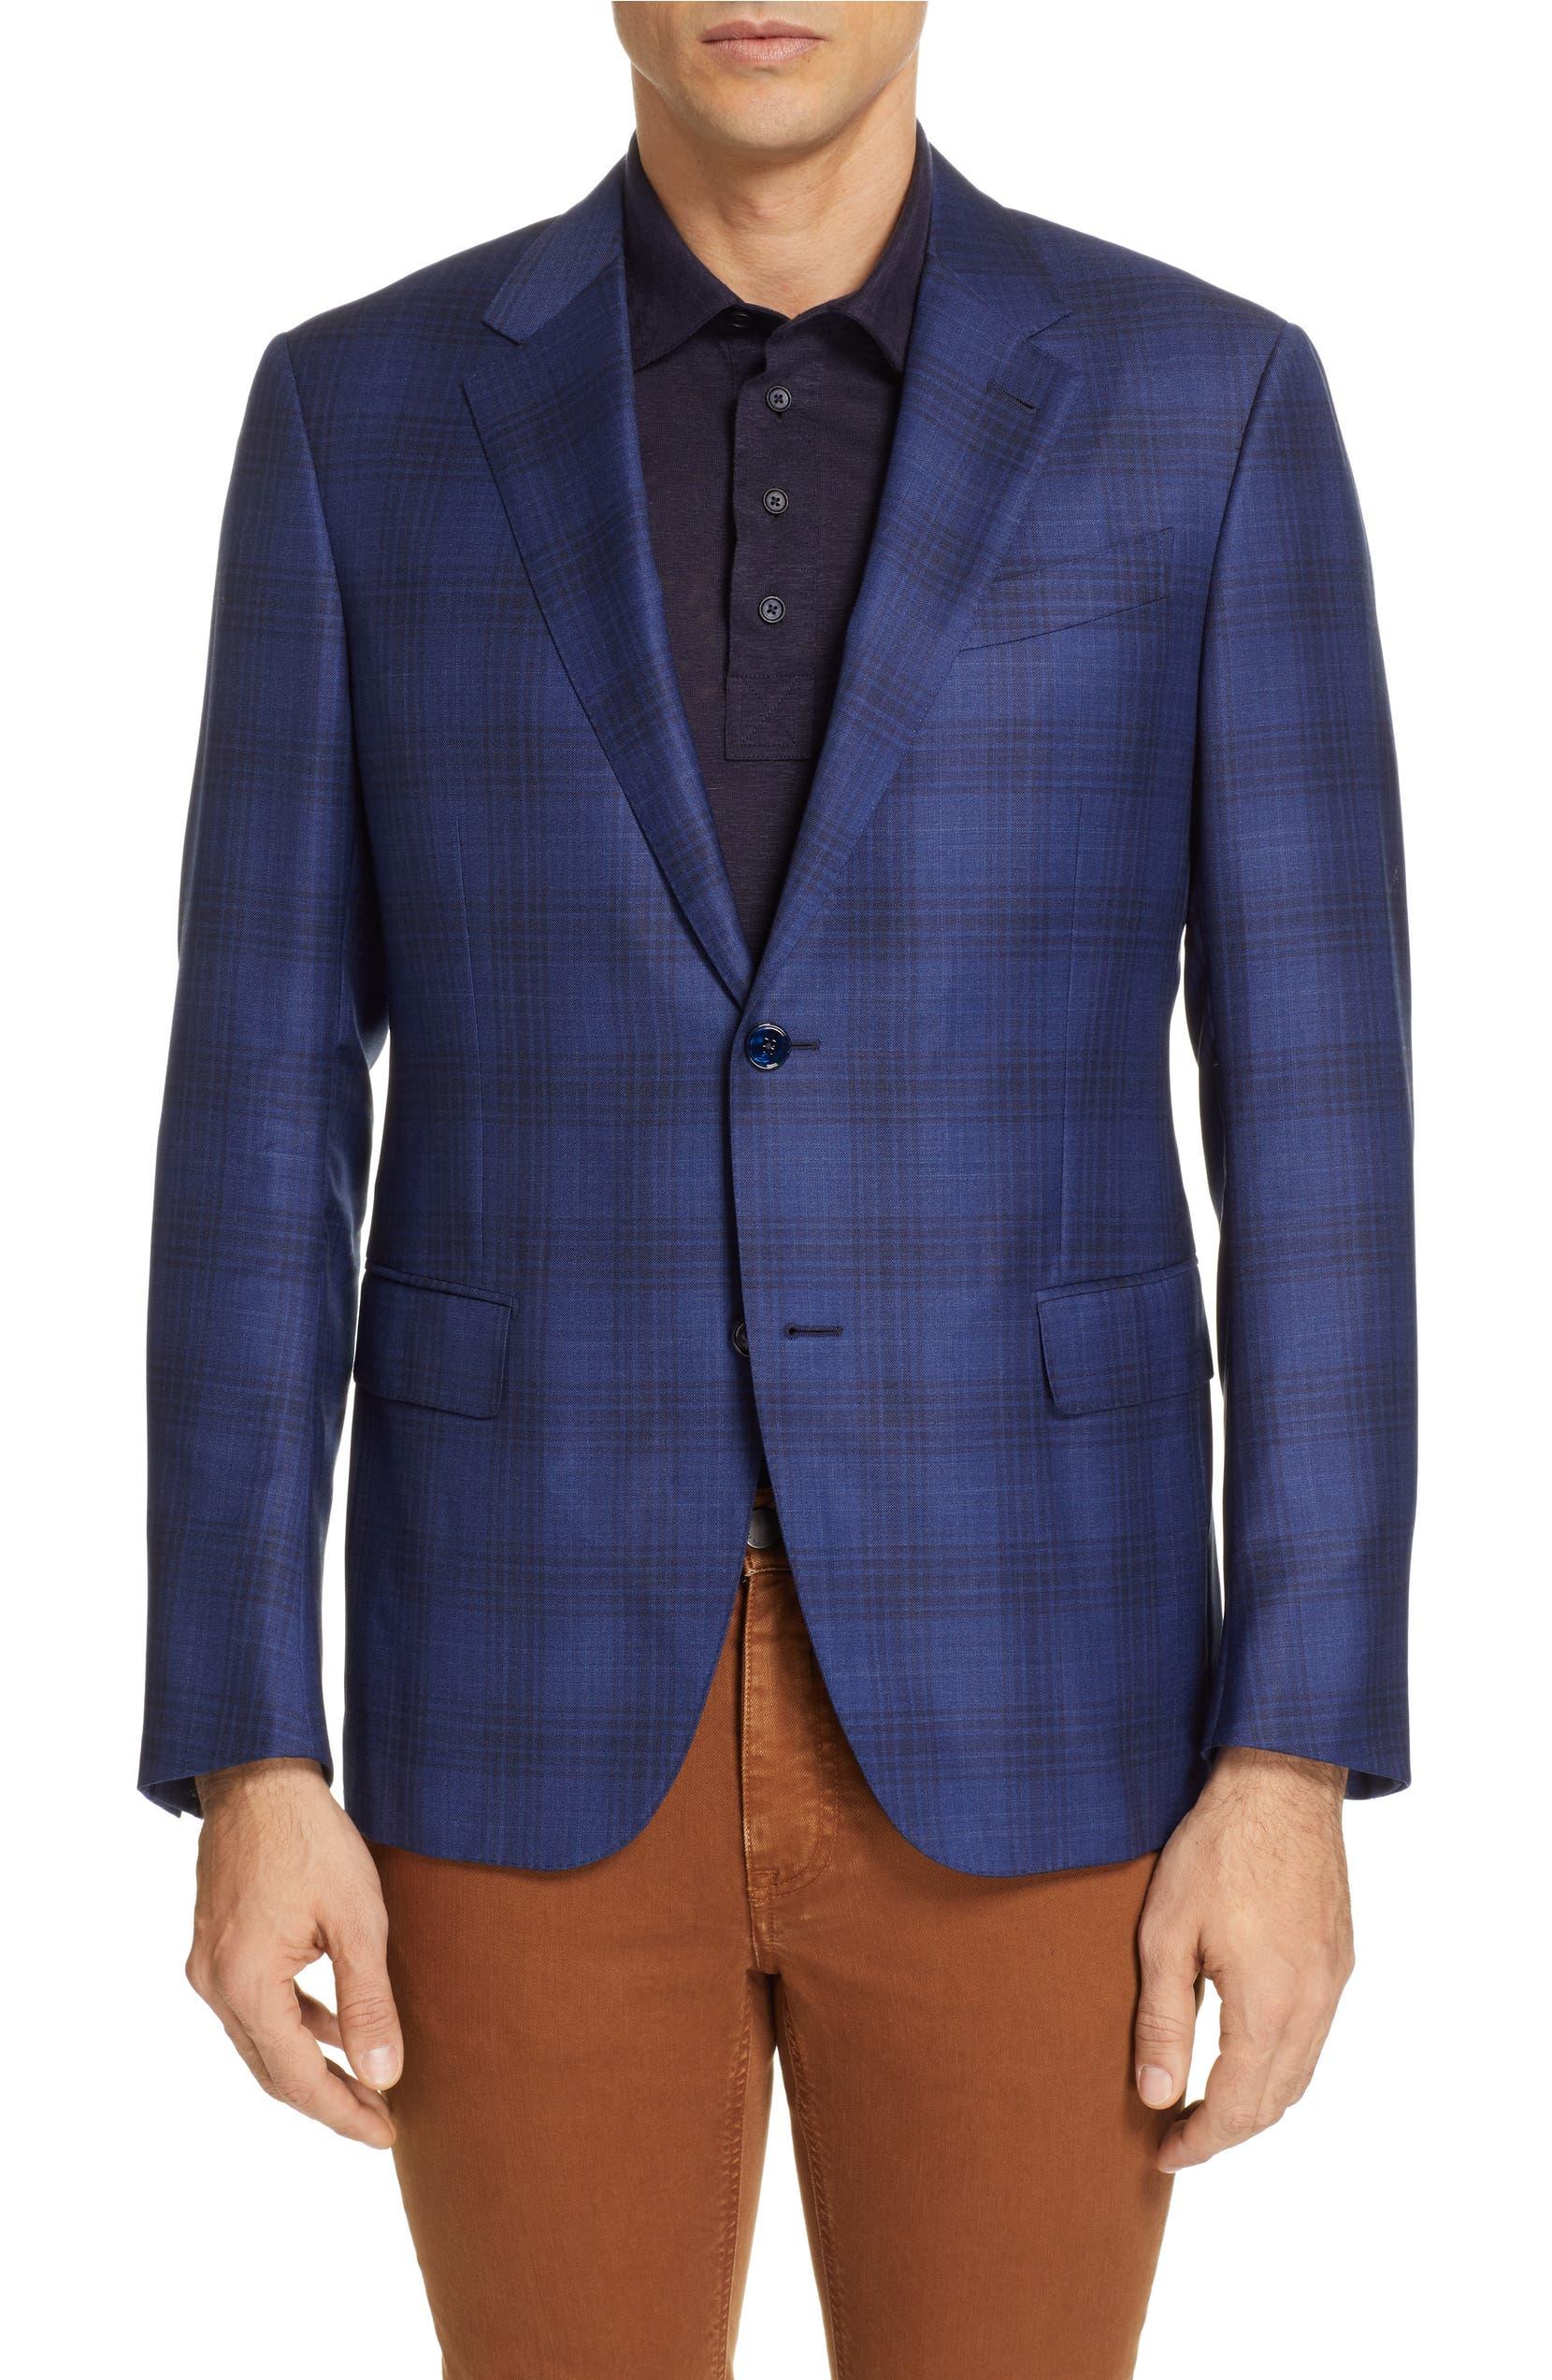 6ed5df5c Ermenegildo Zegna Achillfarm Trim Fit Plaid Wool & Silk Sport Coat ...